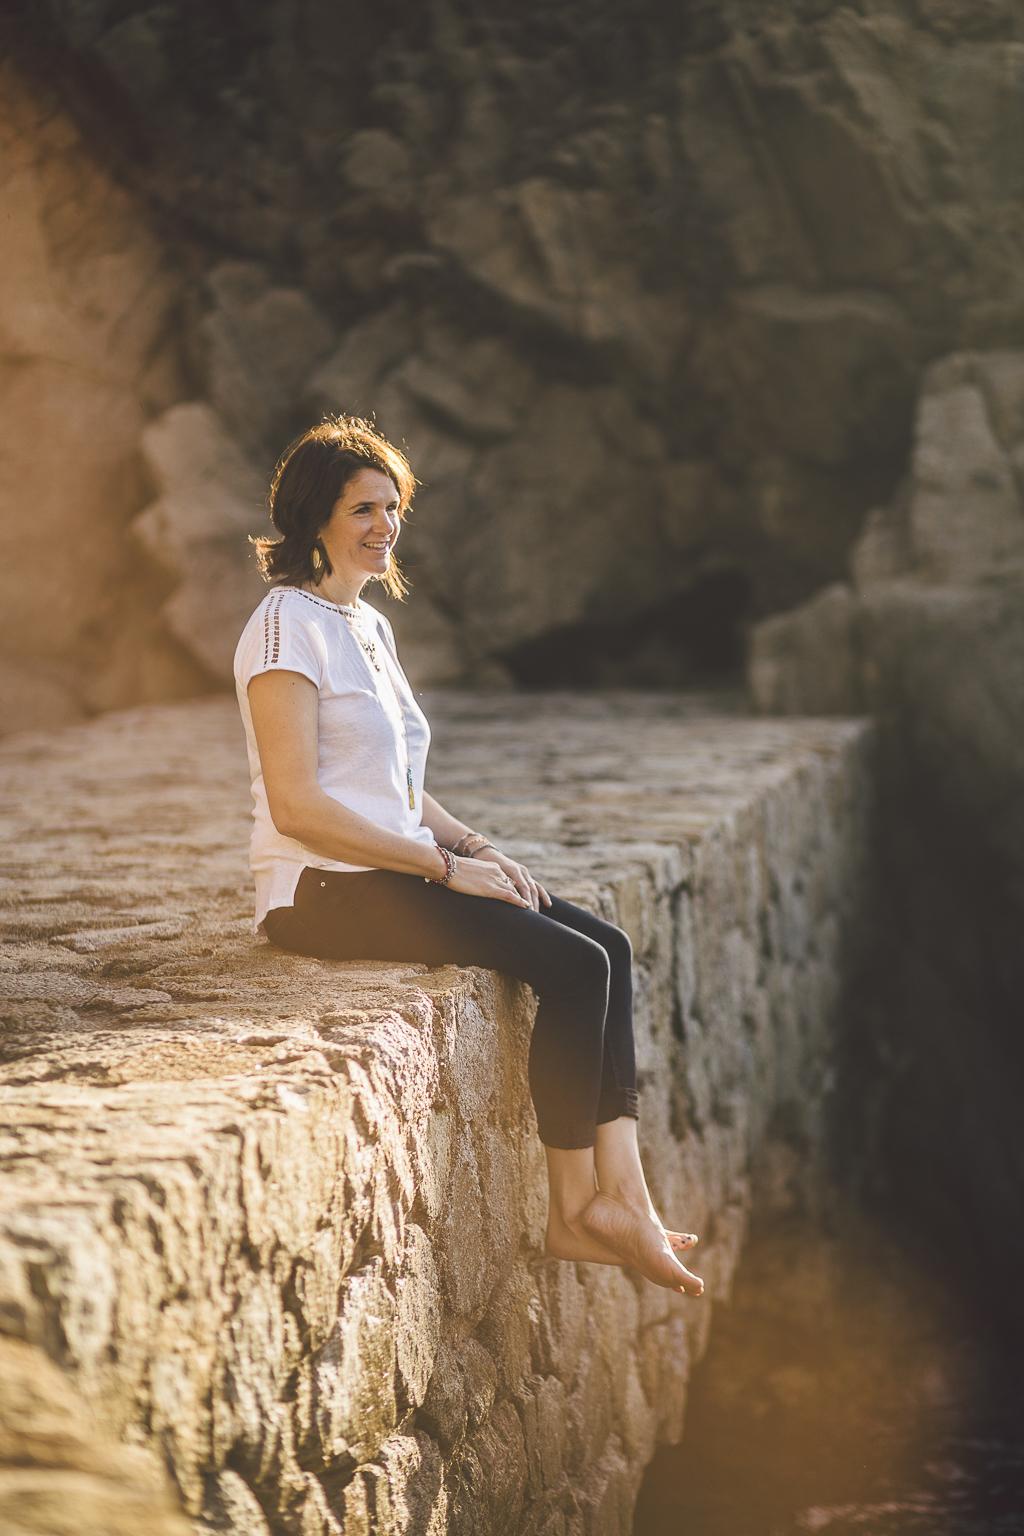 fotógrafo book empresarial :: book de empresa :: fotografía personal :: fotografía natural en la playa :: Fotógrafo Lloret de Mar